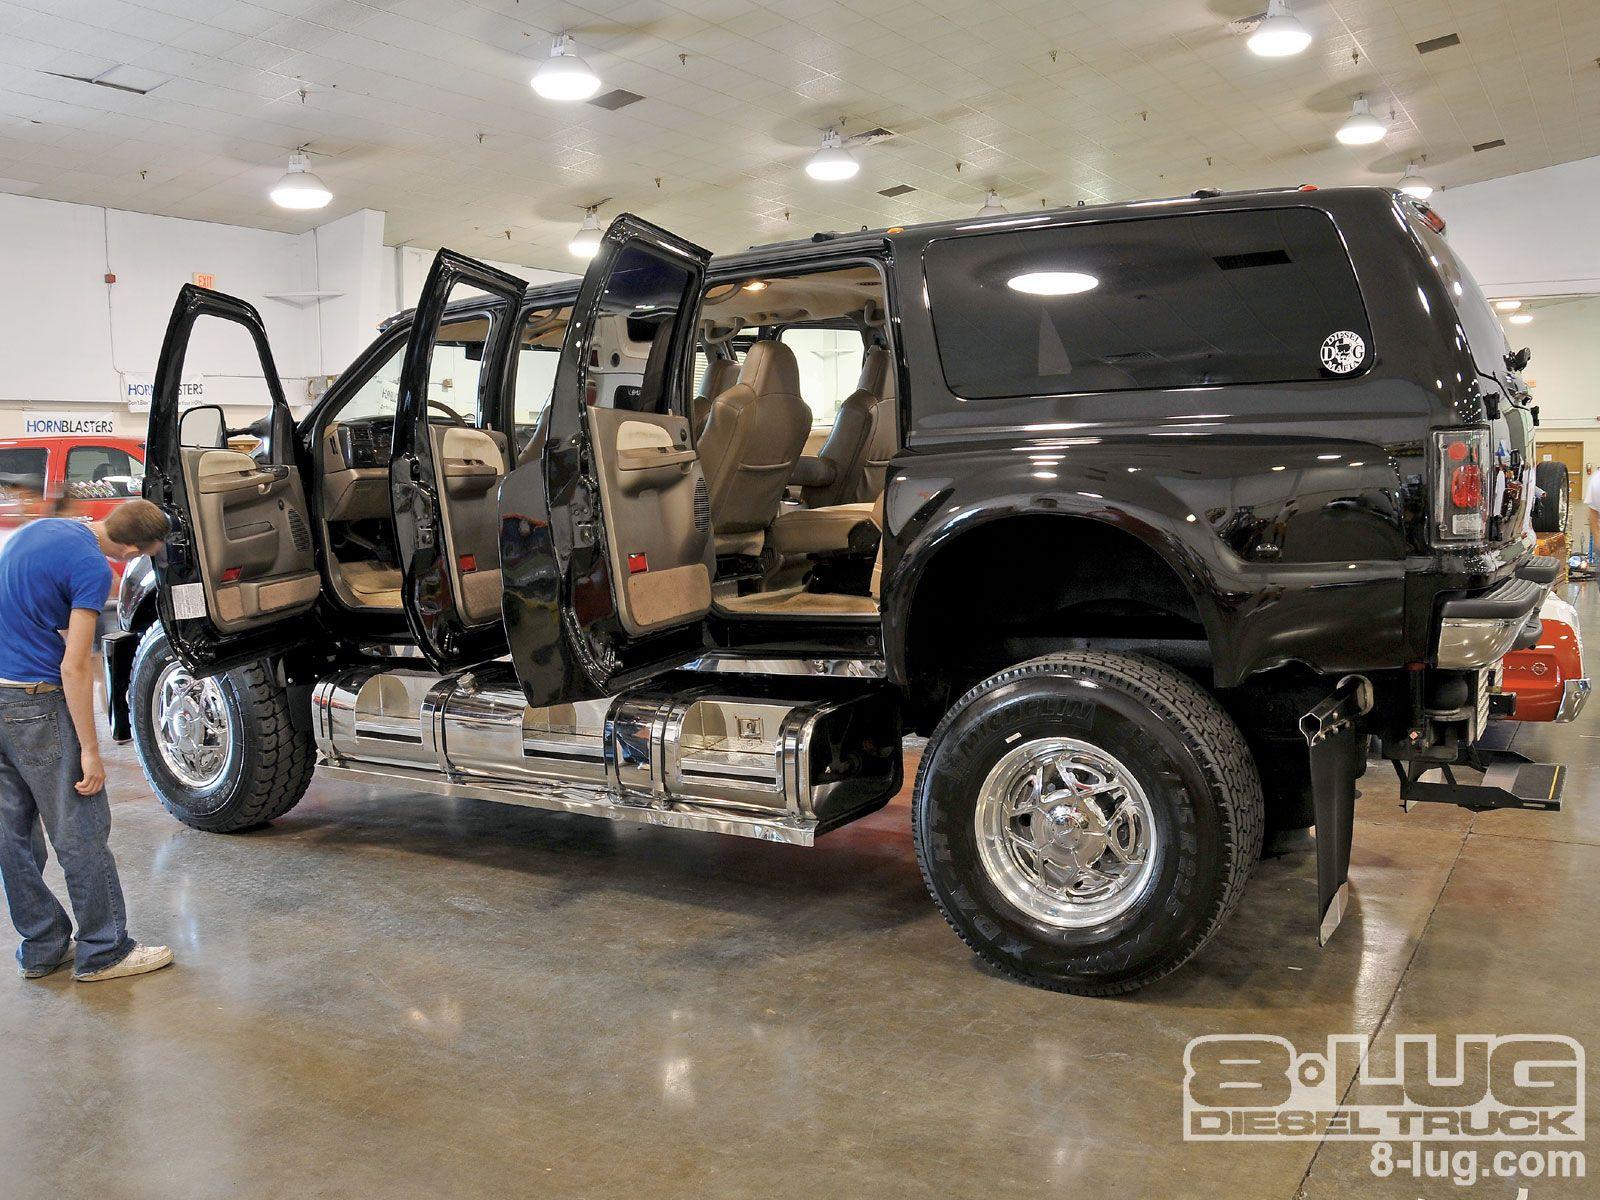 hight resolution of s 73 f650 trucks lifted trucks pickup trucks 6x6 truck customised